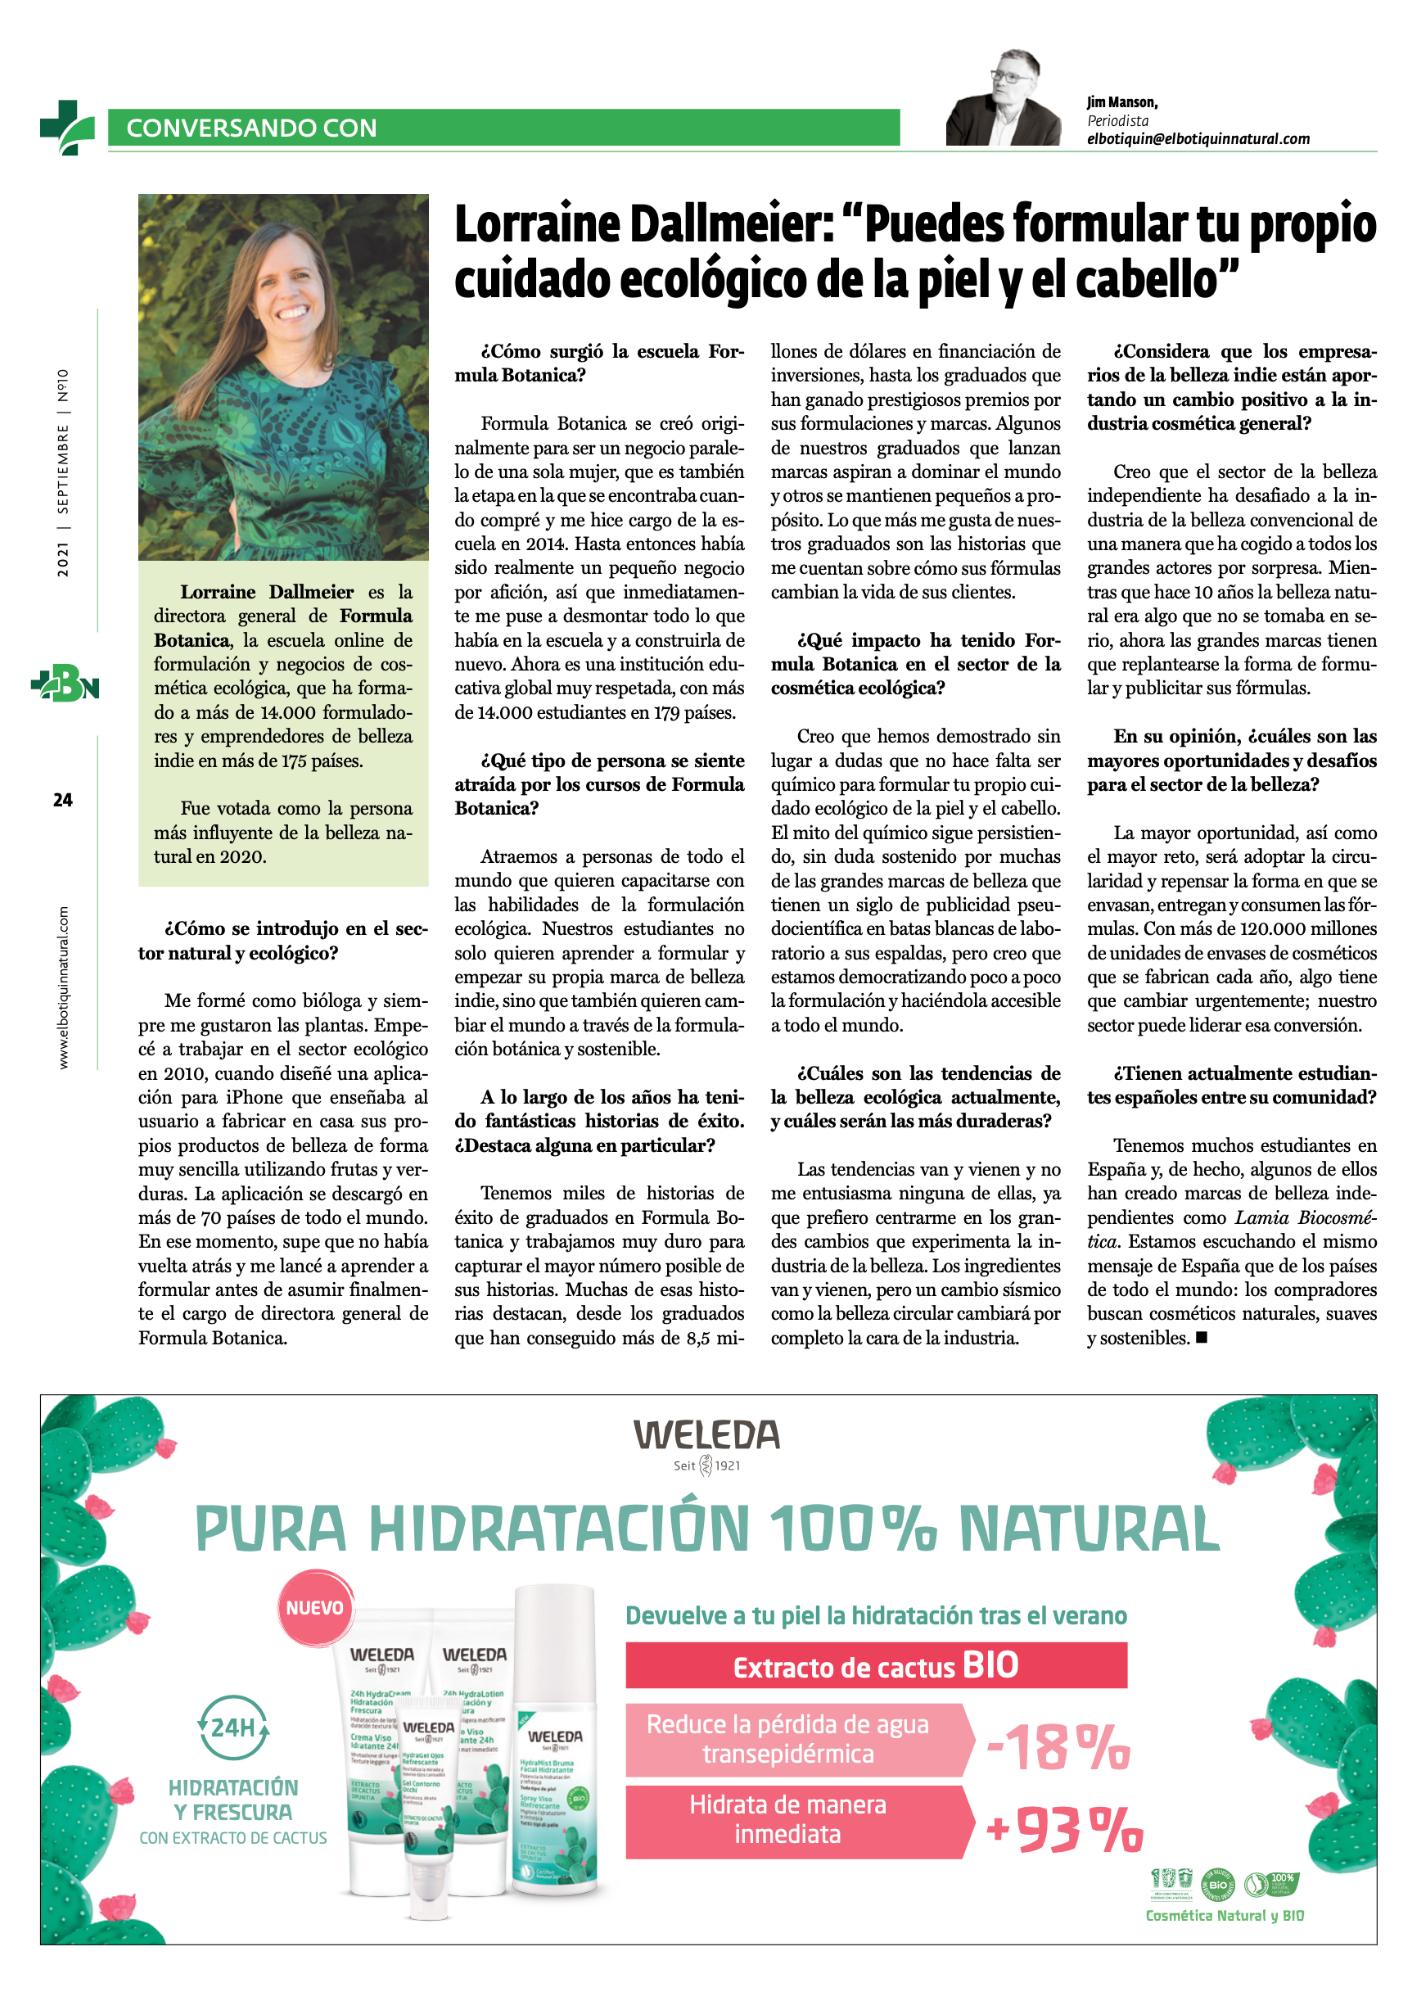 Lorraine Dallmeier - Interview 2021 Bio Eco Actual